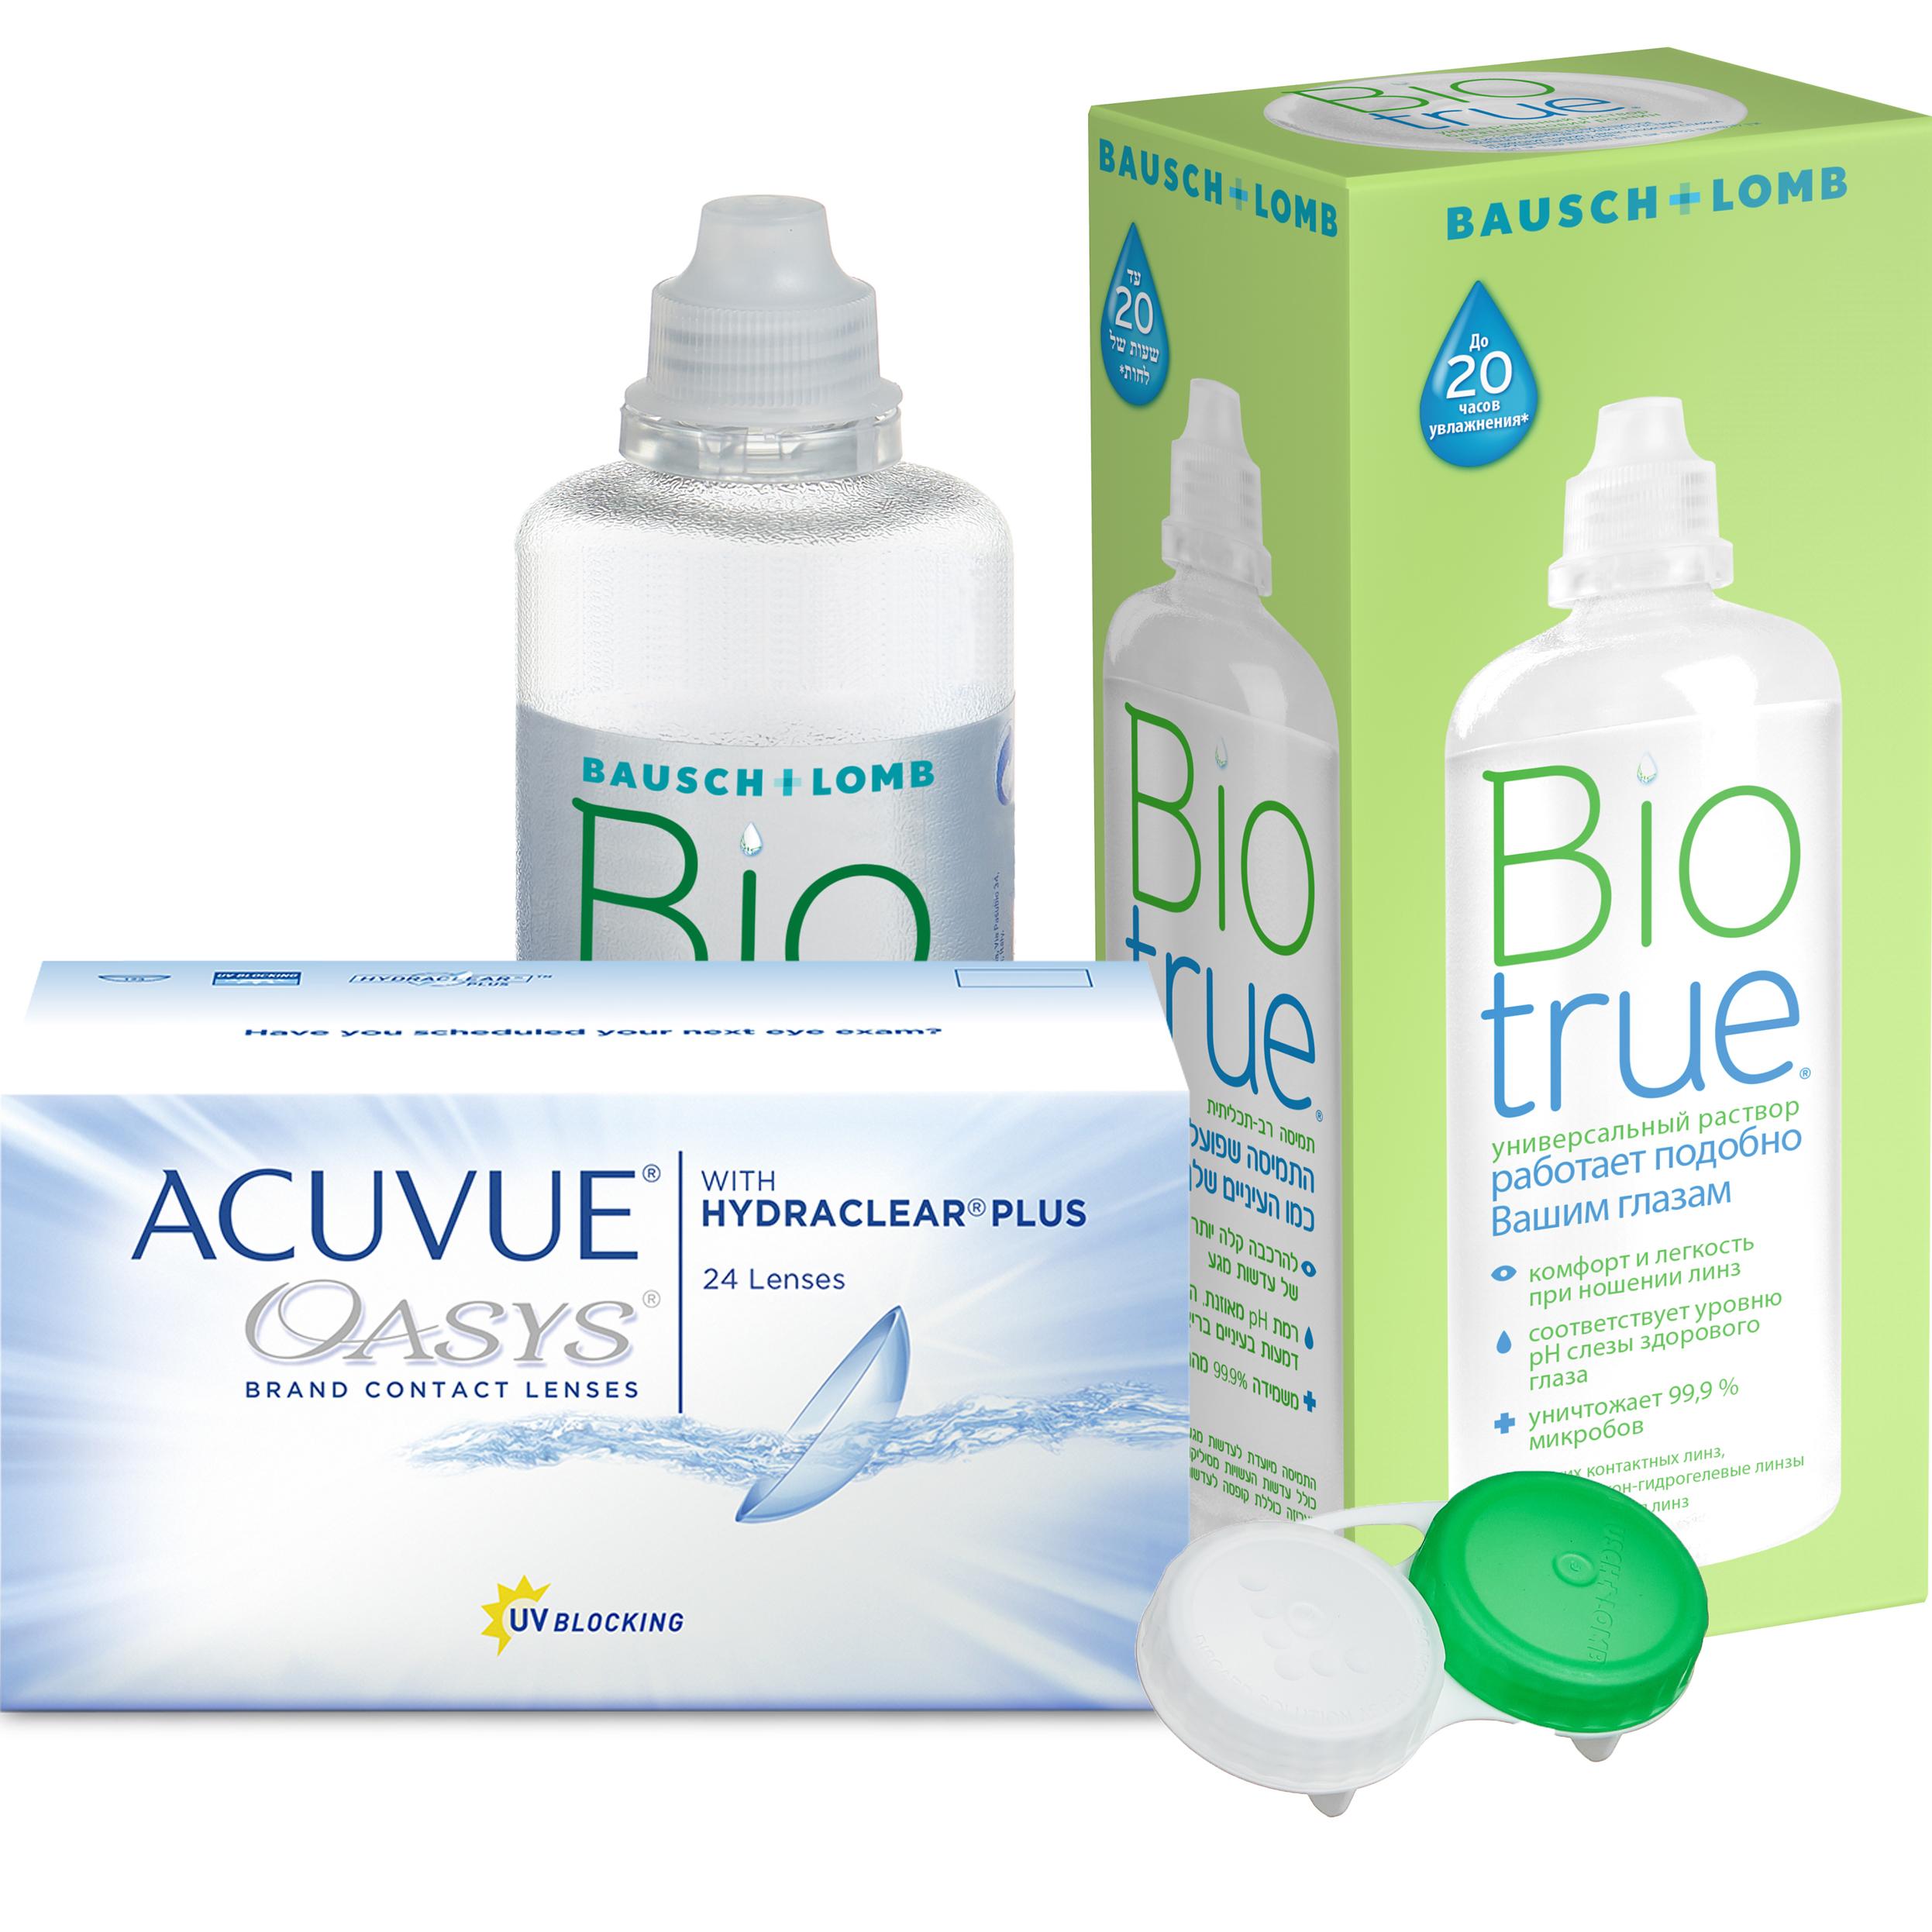 Купить Oasys with Hydraclear Plus 24 линзы + Biotrue, Контактные линзы Acuvue Oasys with Hydraclear Plus 24 линзы R 8.8 +6, 00 + Biotrue 300 мл